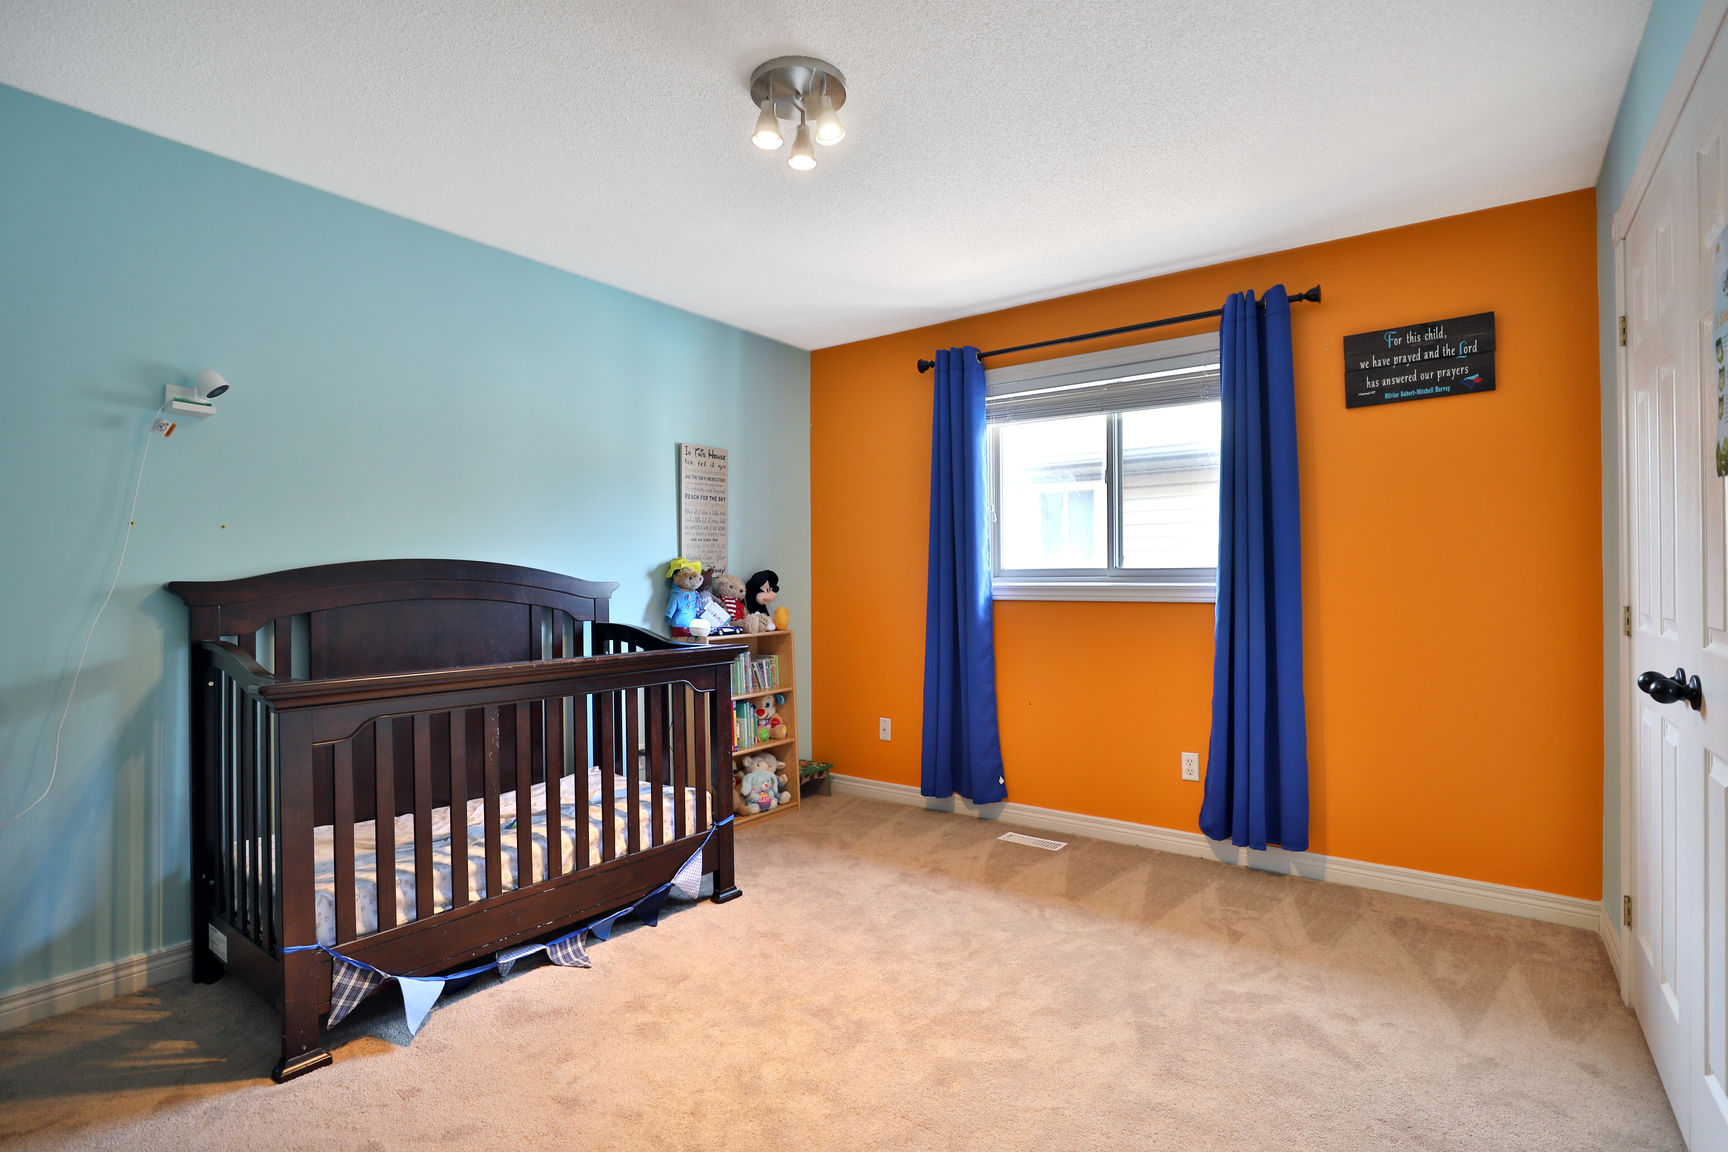 Glanbrook Binbrook 26 Switzer bedroom 2 3 - Recently SOLD in Binbrook